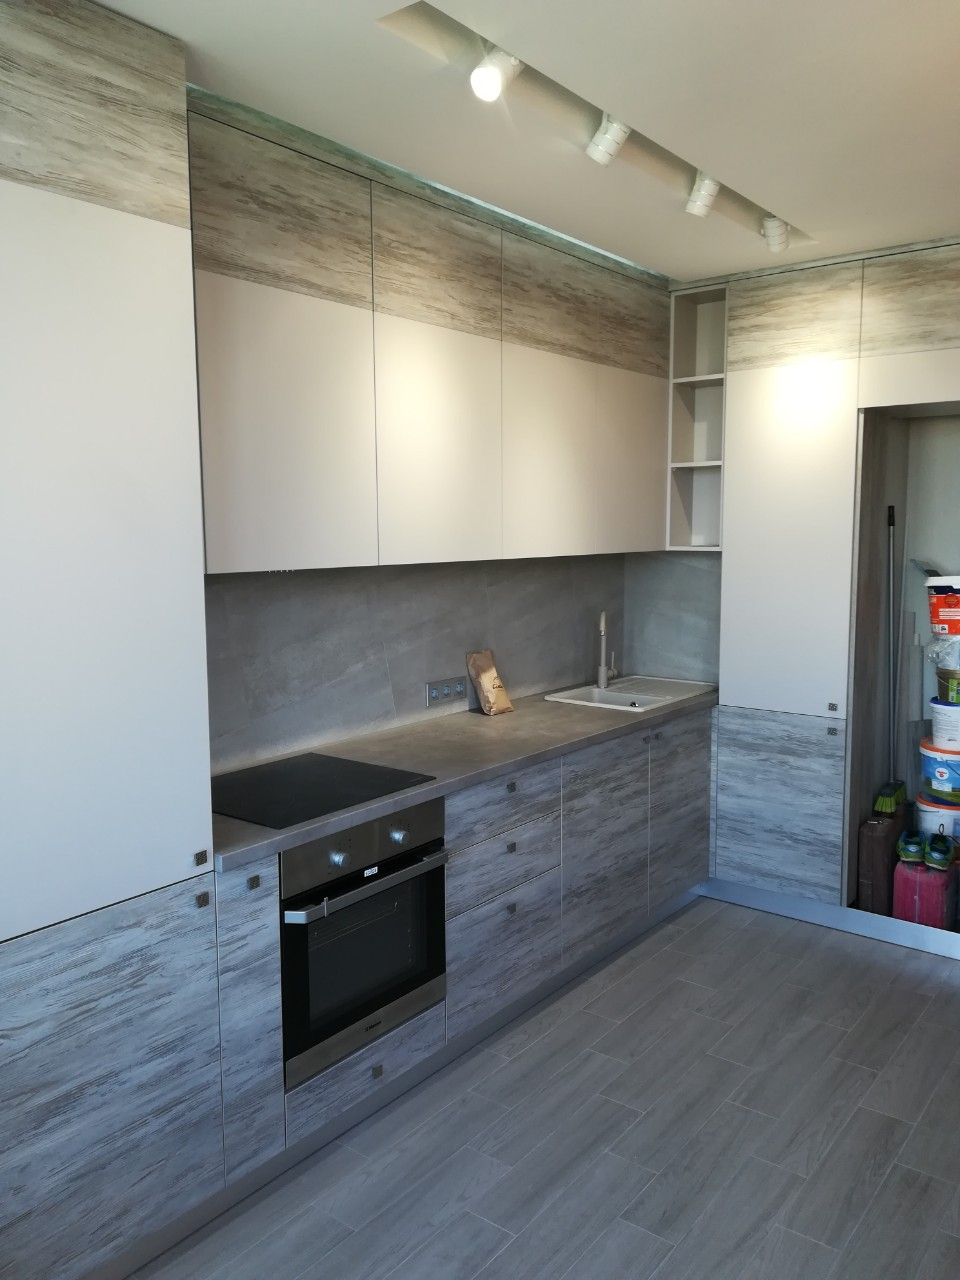 Кухня на заказ 290519-3  студио лофт